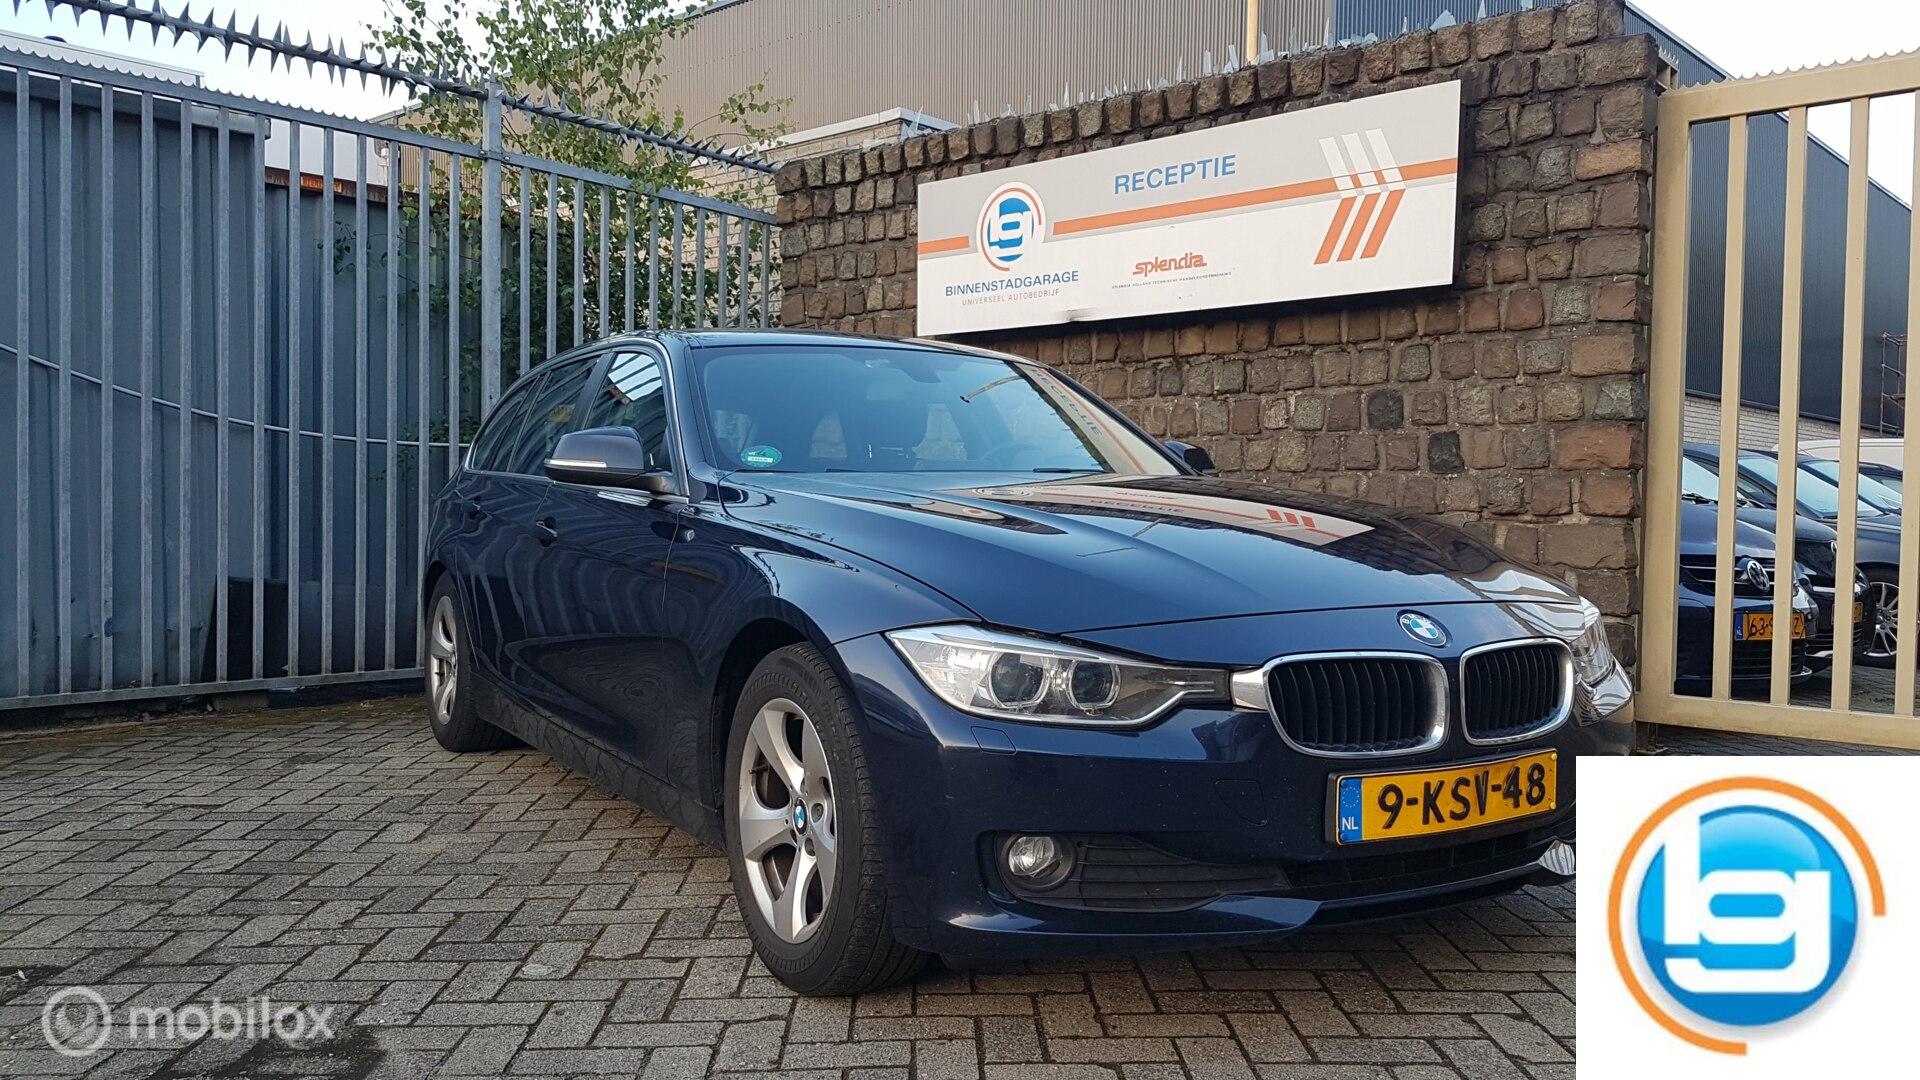 BMW 3-serie Touring 320d EfficientDynamics Edition